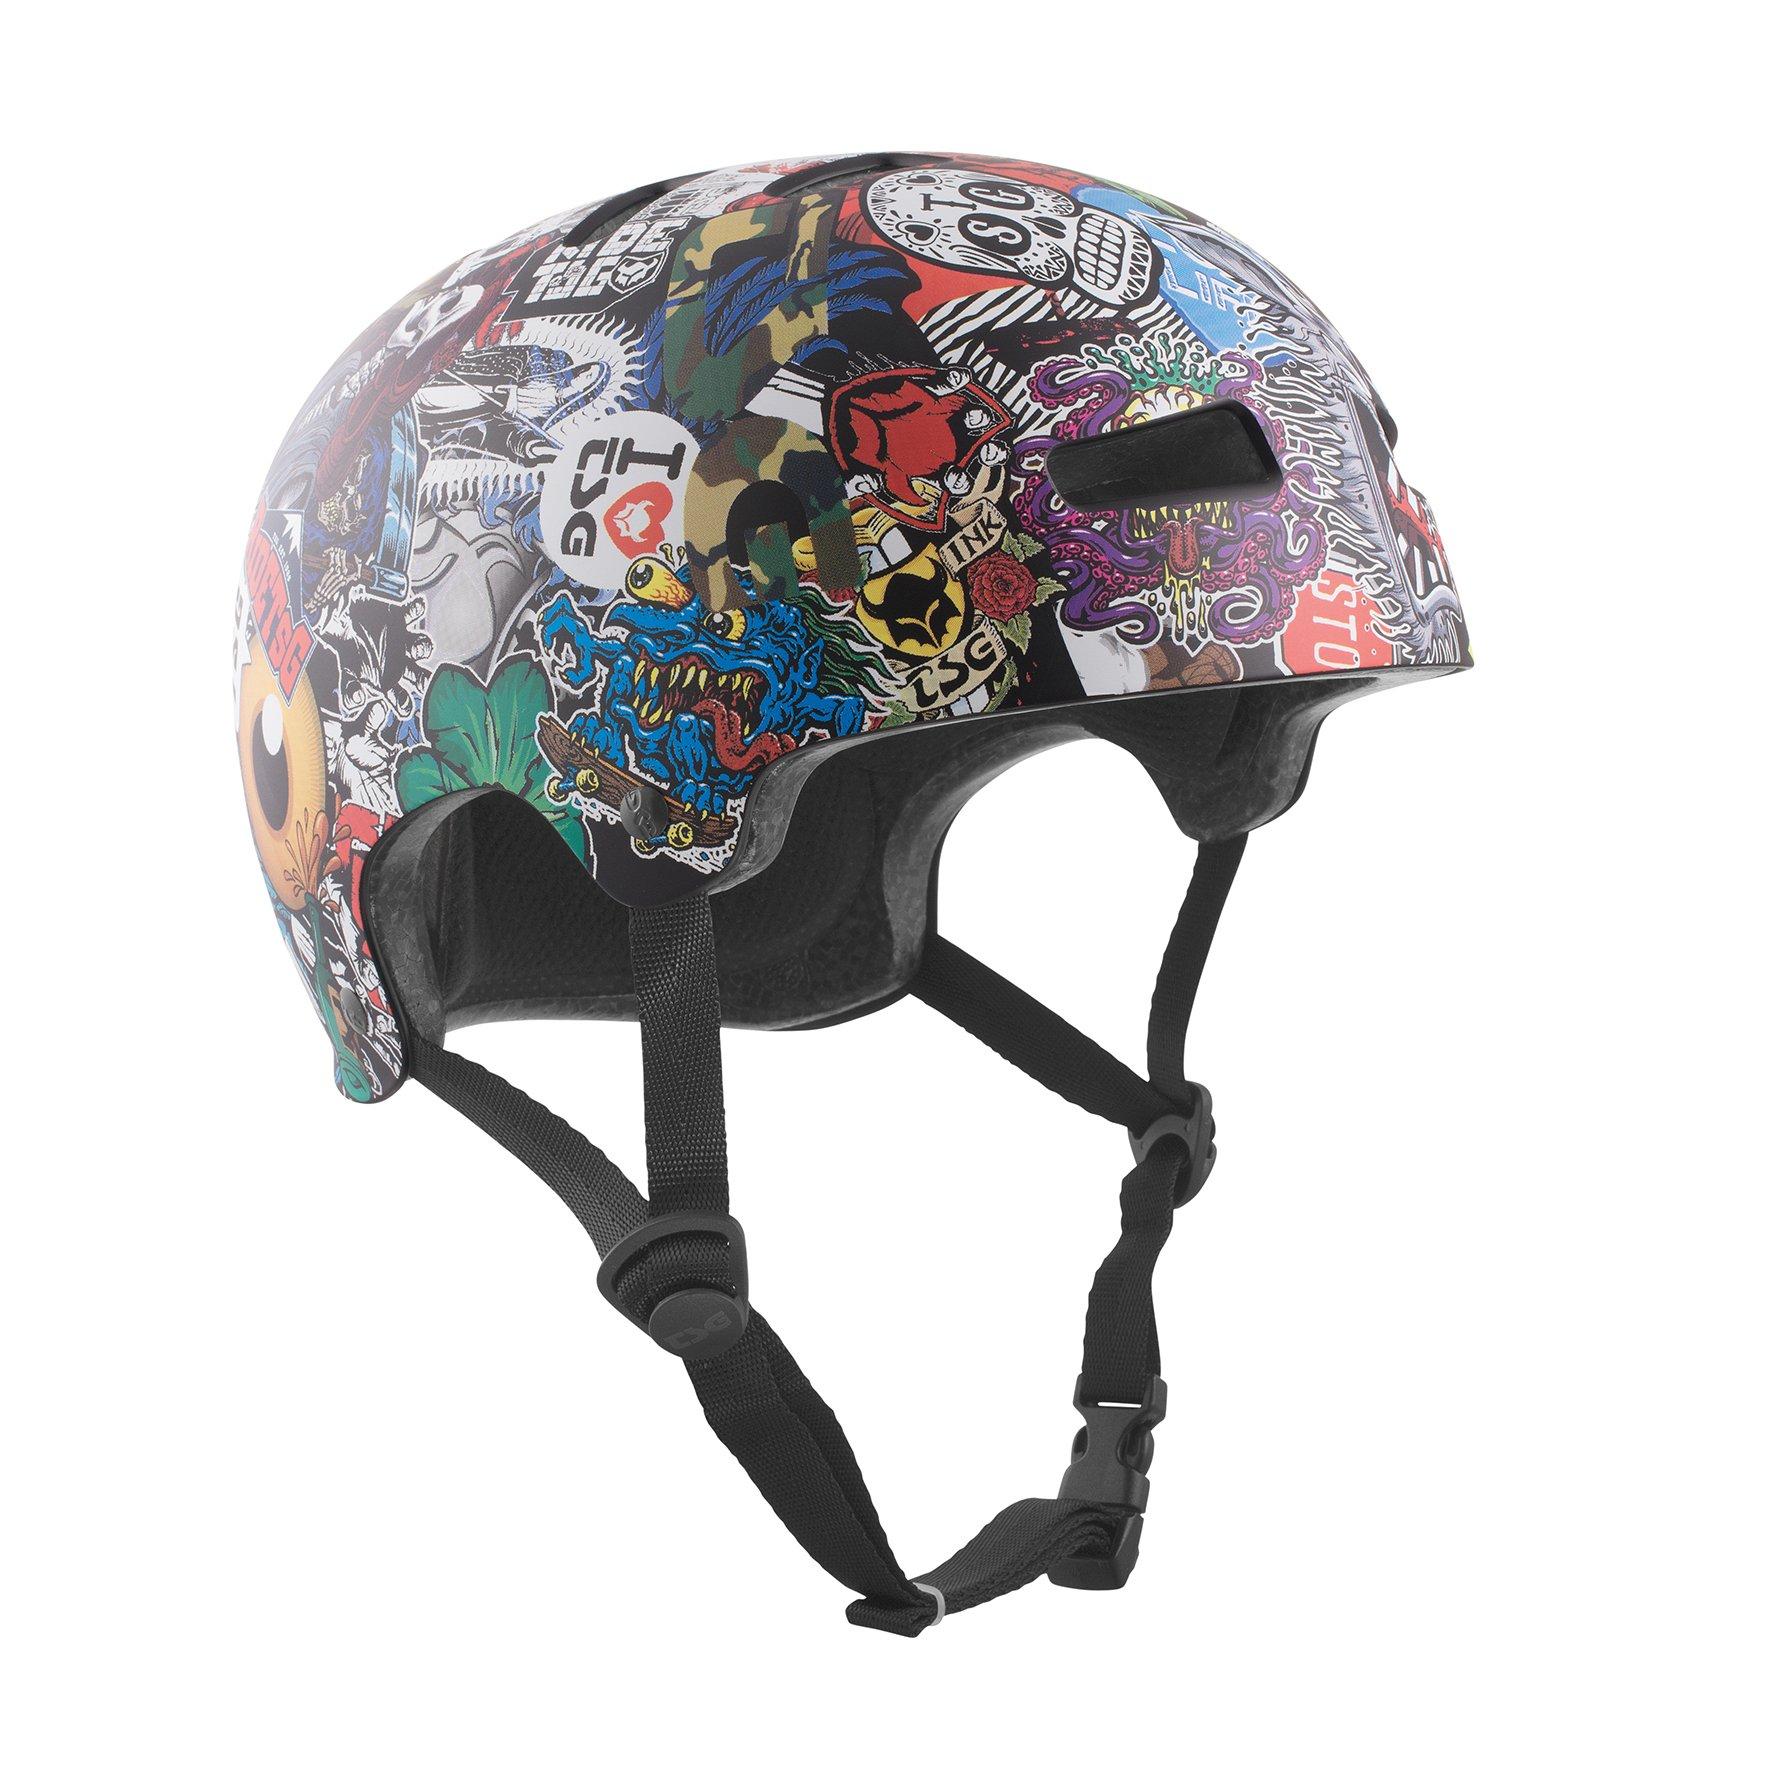 TSG - Evolution Graphic Design (collage, L/XL 57-59 cm) Helmet for Bicycle Skateboard